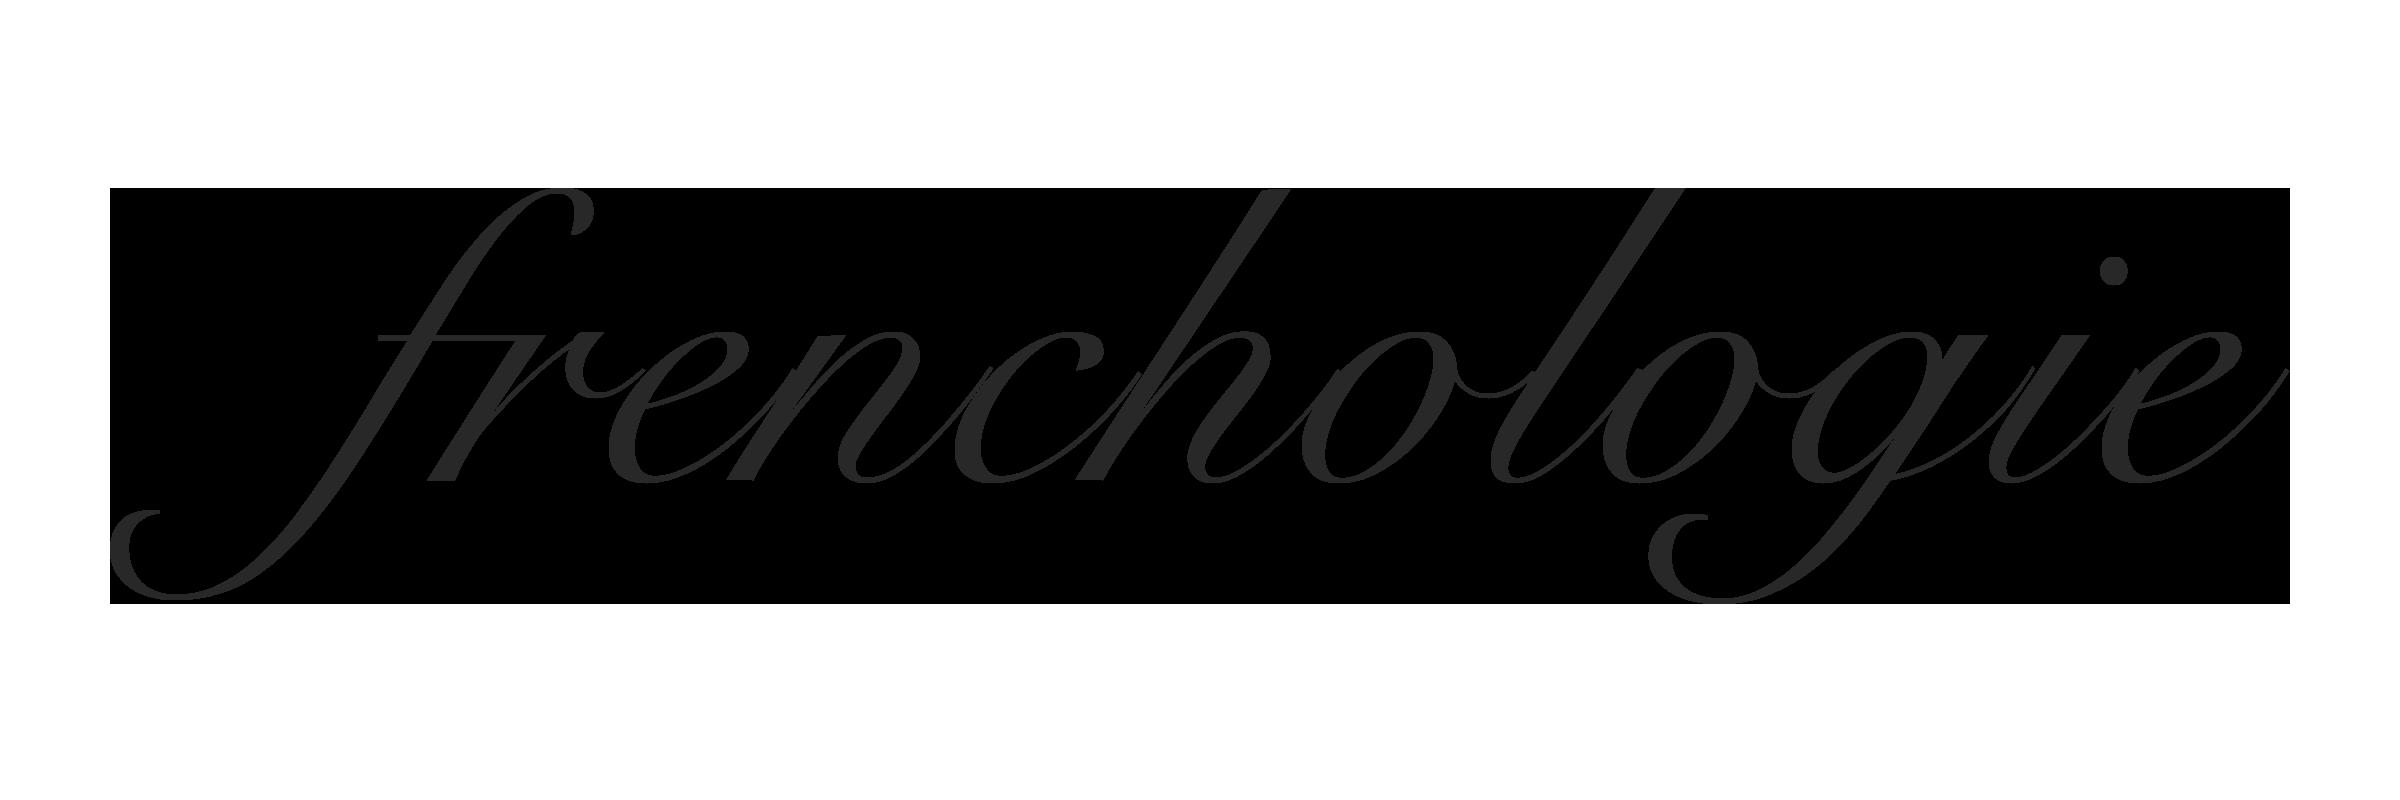 Simple fr logo.png